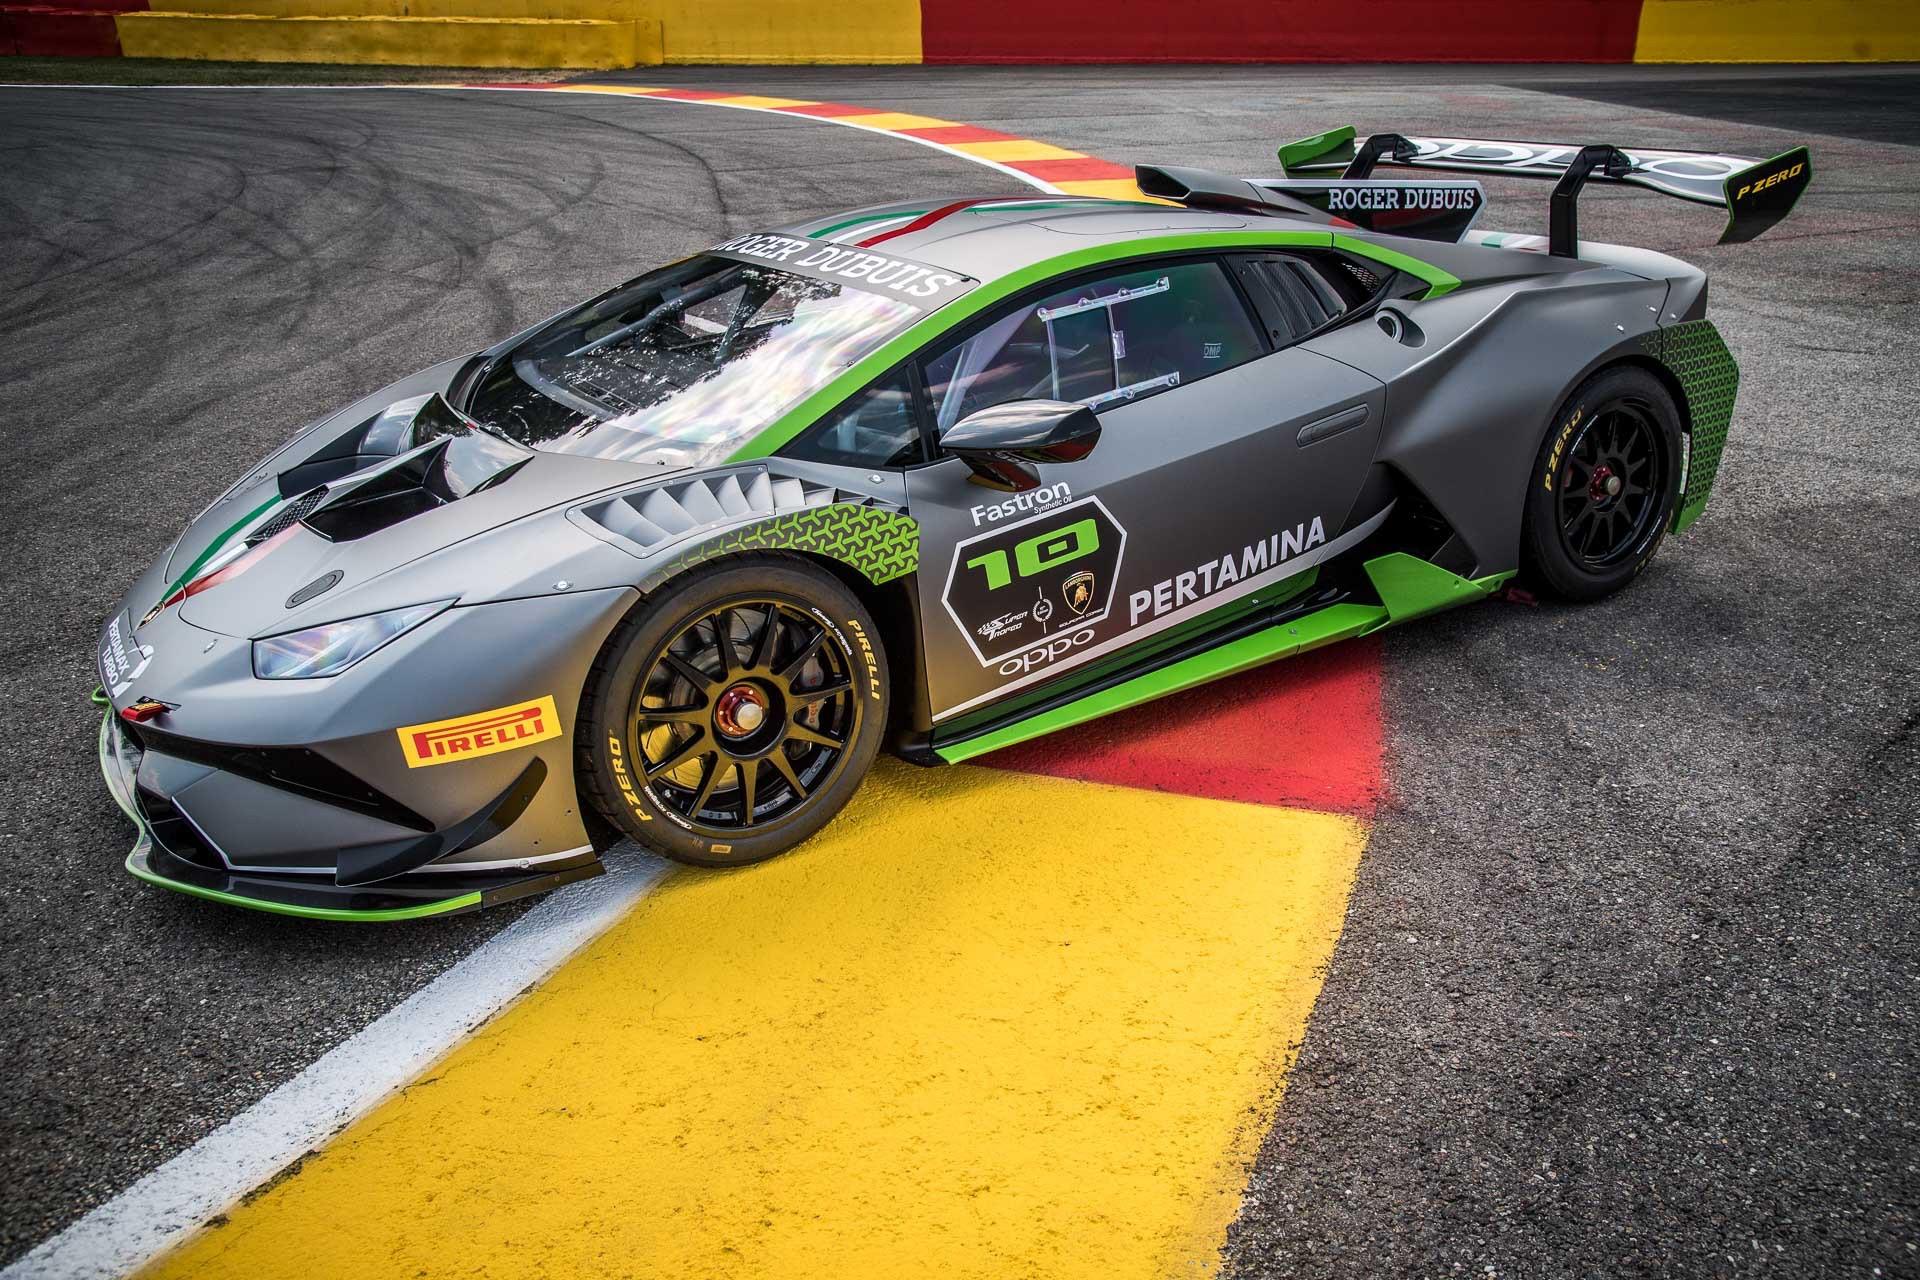 Lamborghini_Huracan_Super_Trofeo_Evo_10th_Edition_0004